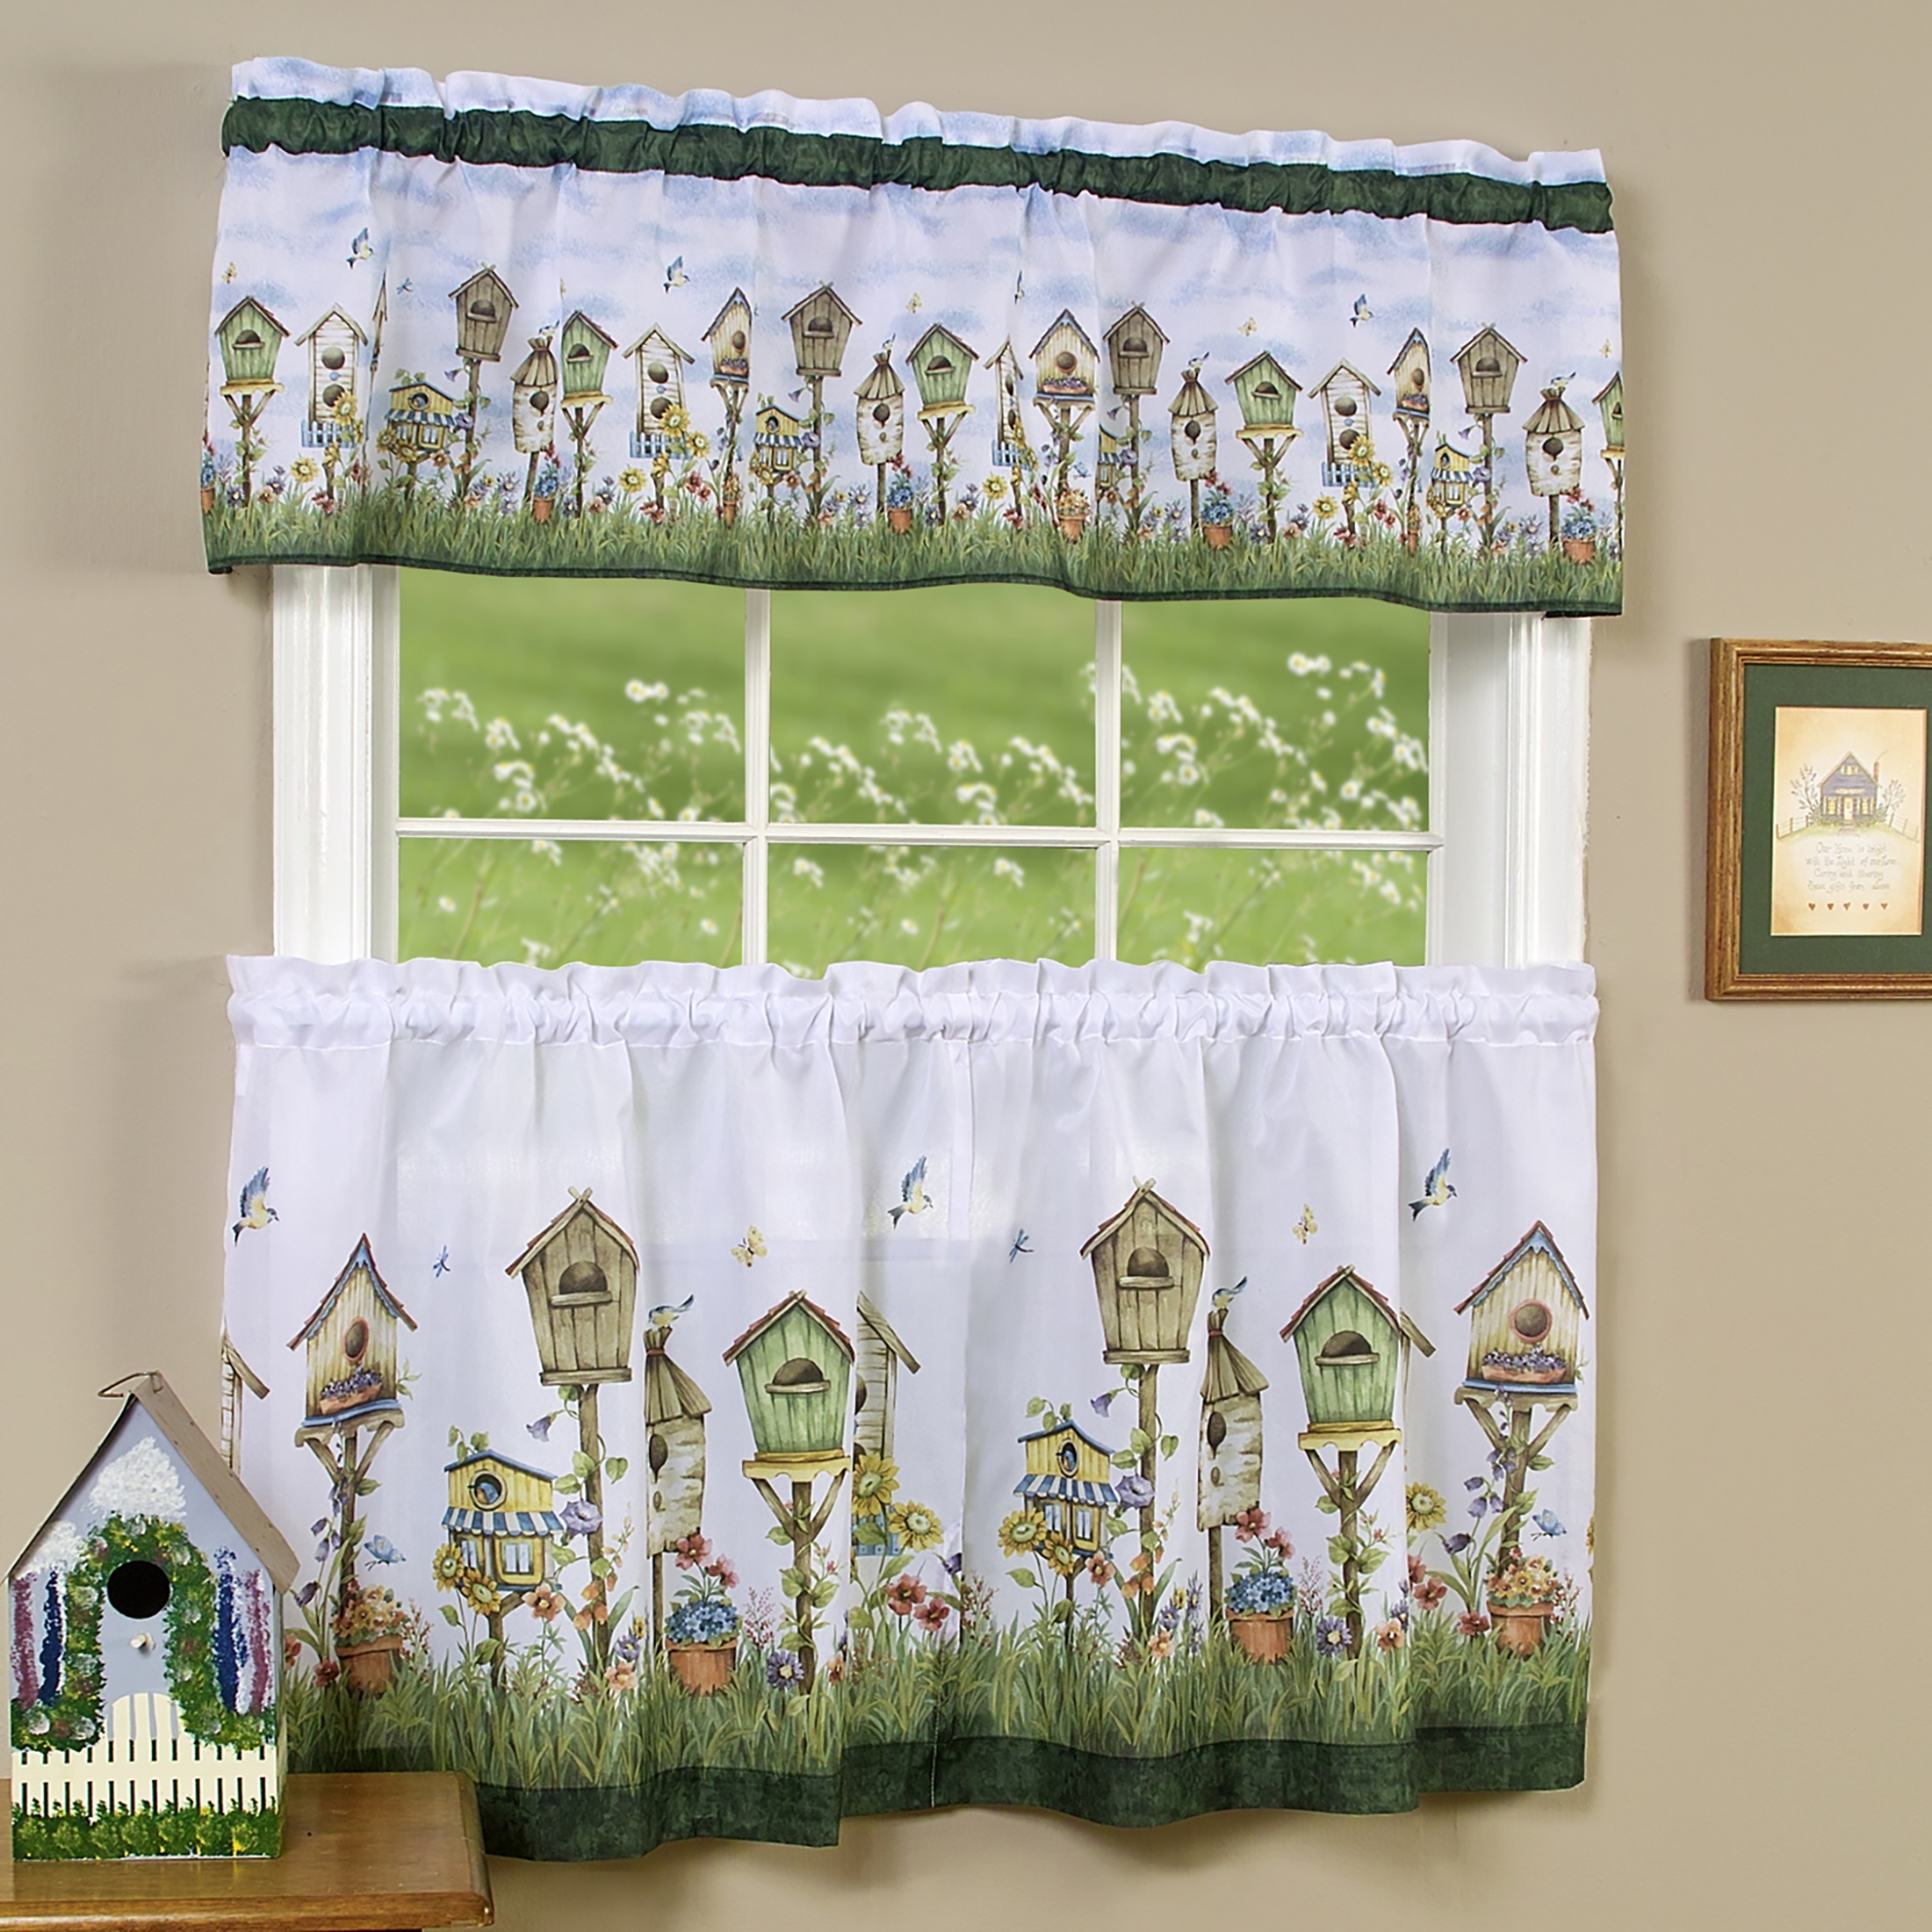 Details about 3PC Floral Window Kitchen Curtain Set Love Birds Birdhouse  Tier Panel & Valance